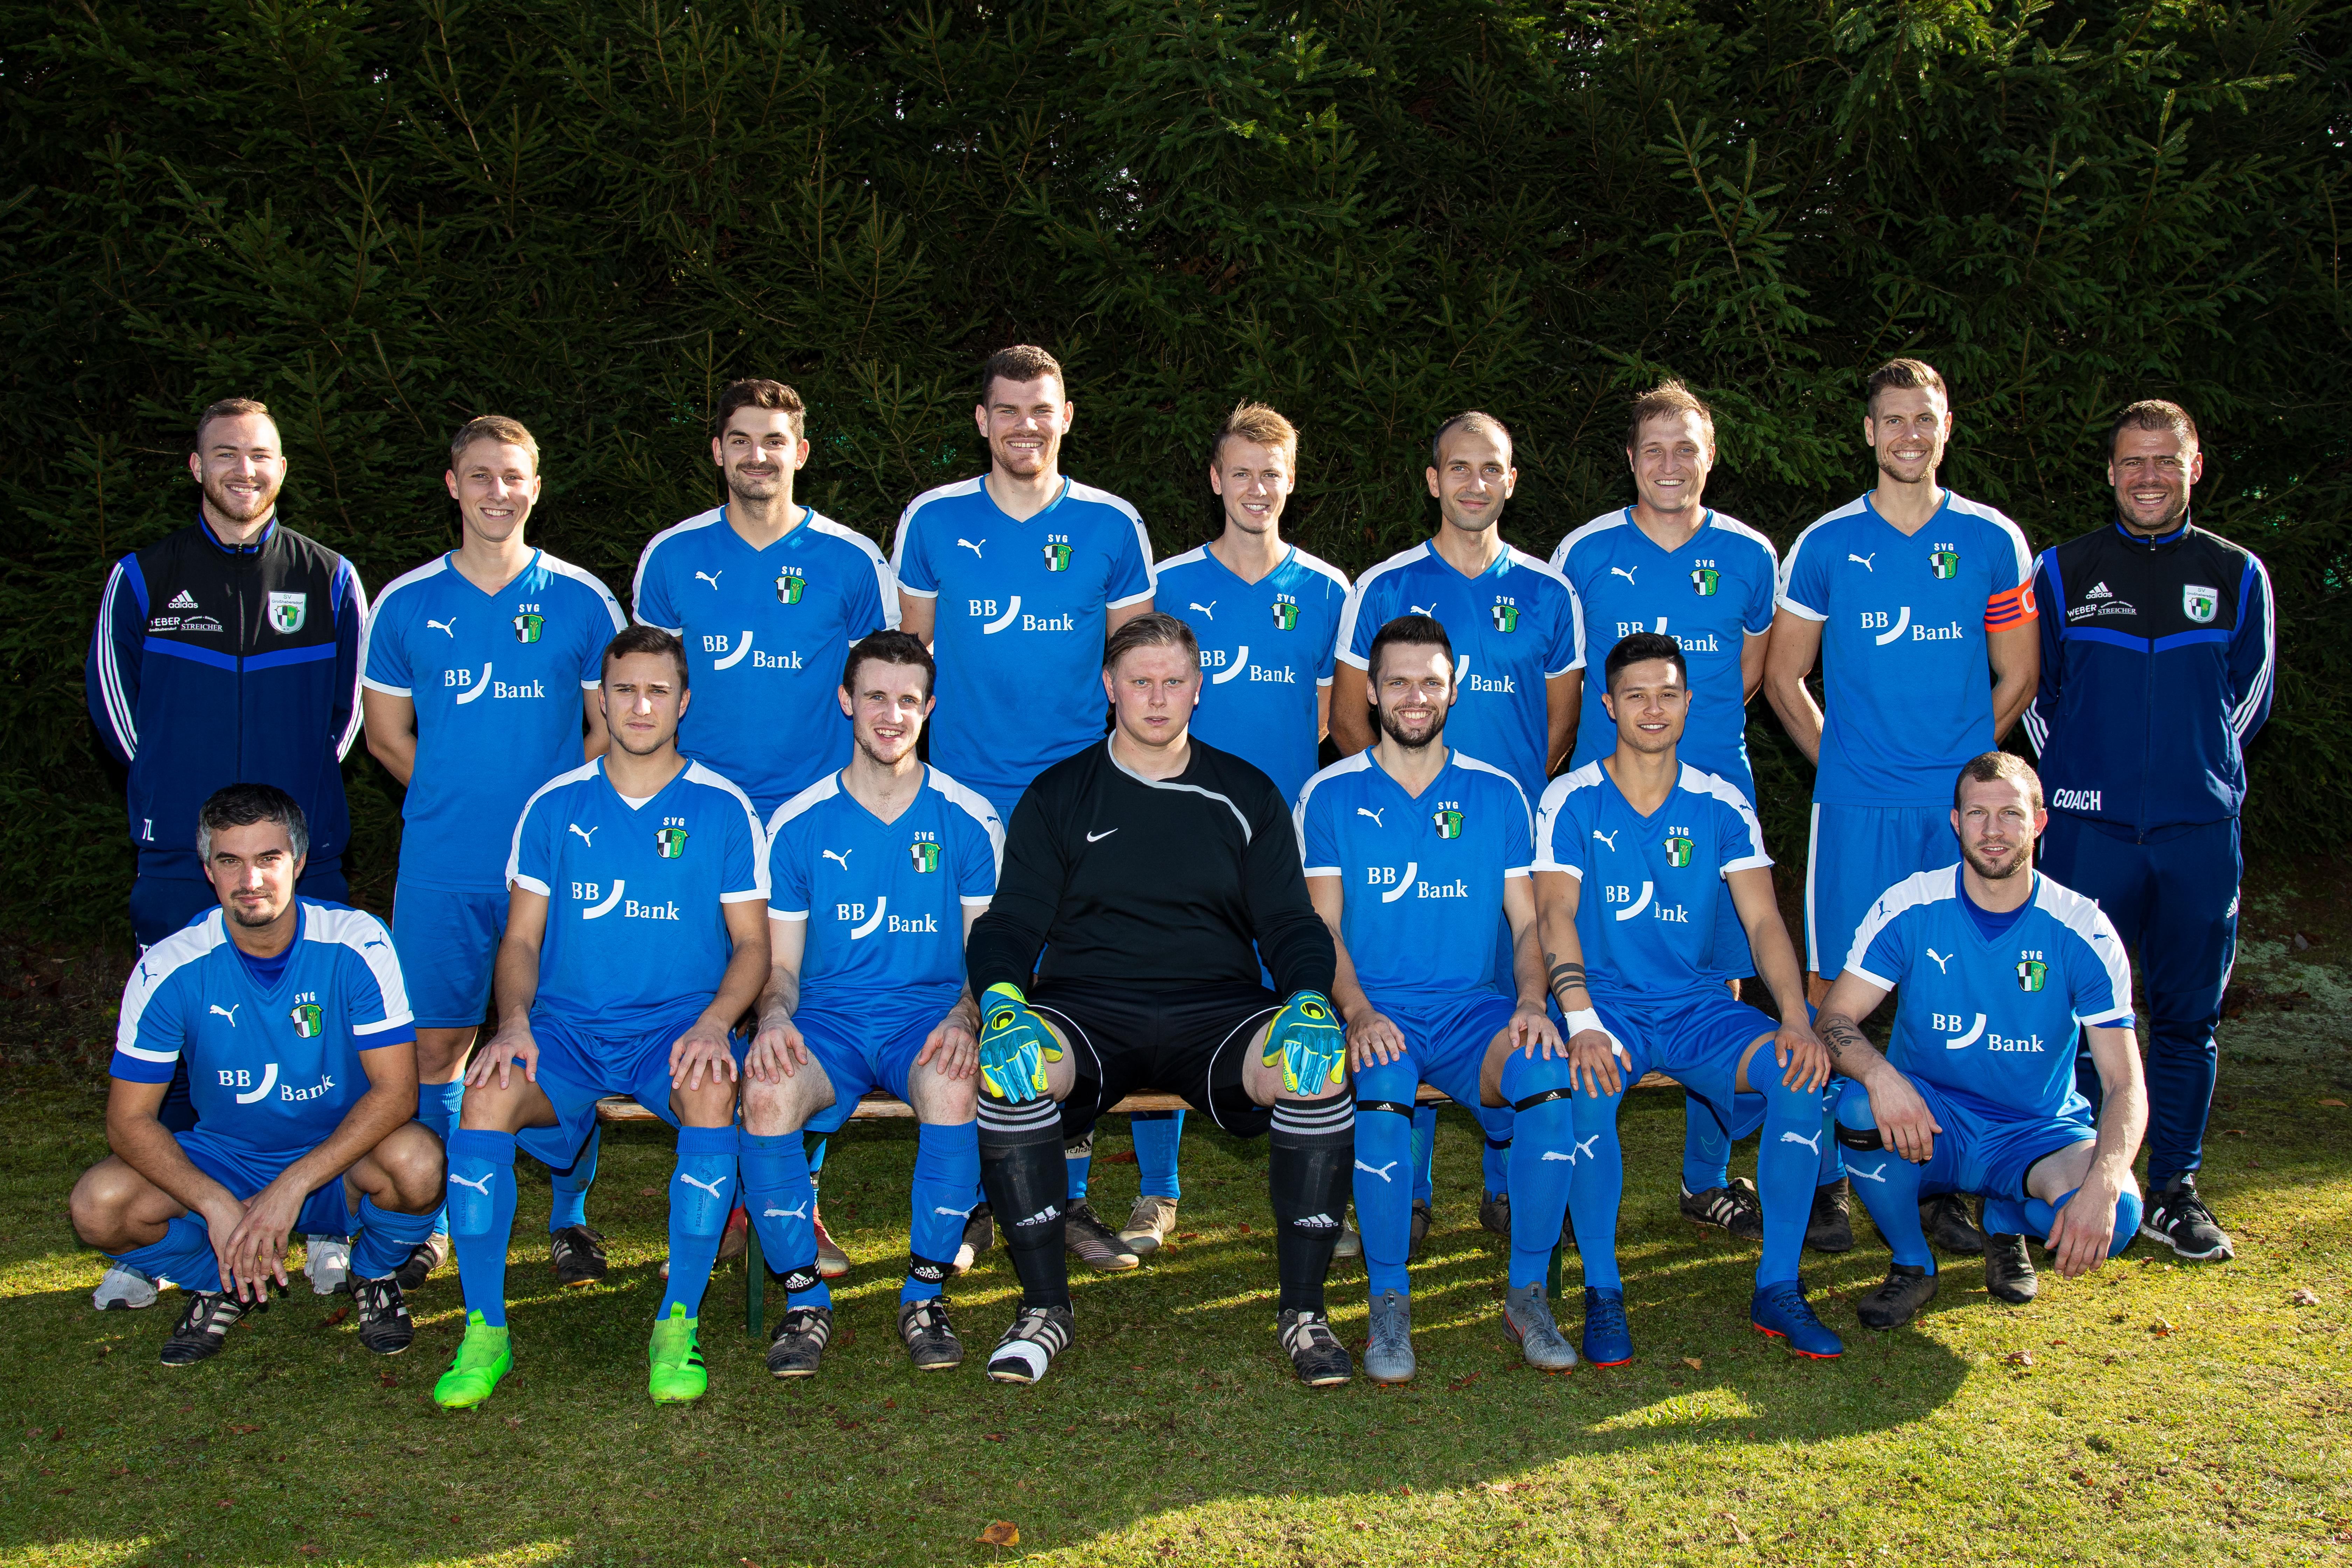 1. Fußball Herren Mannschaft